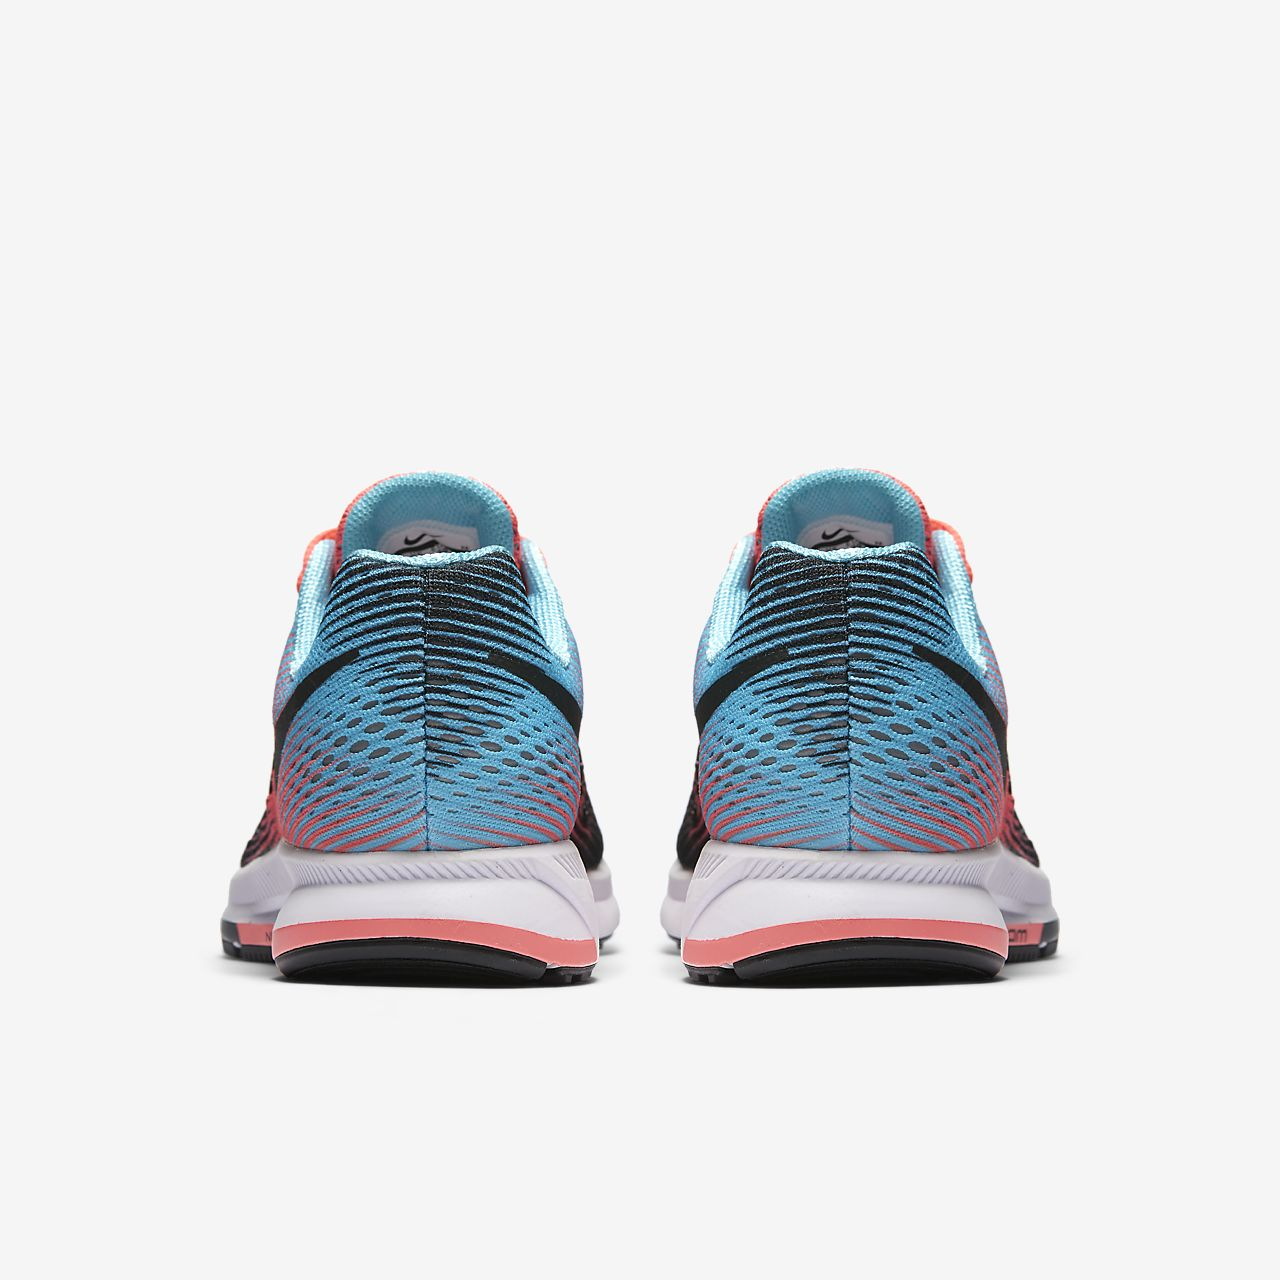 low priced 1d0a2 579e3 ... Nike Air Zoom Pegasus 33 Women s Running Shoe